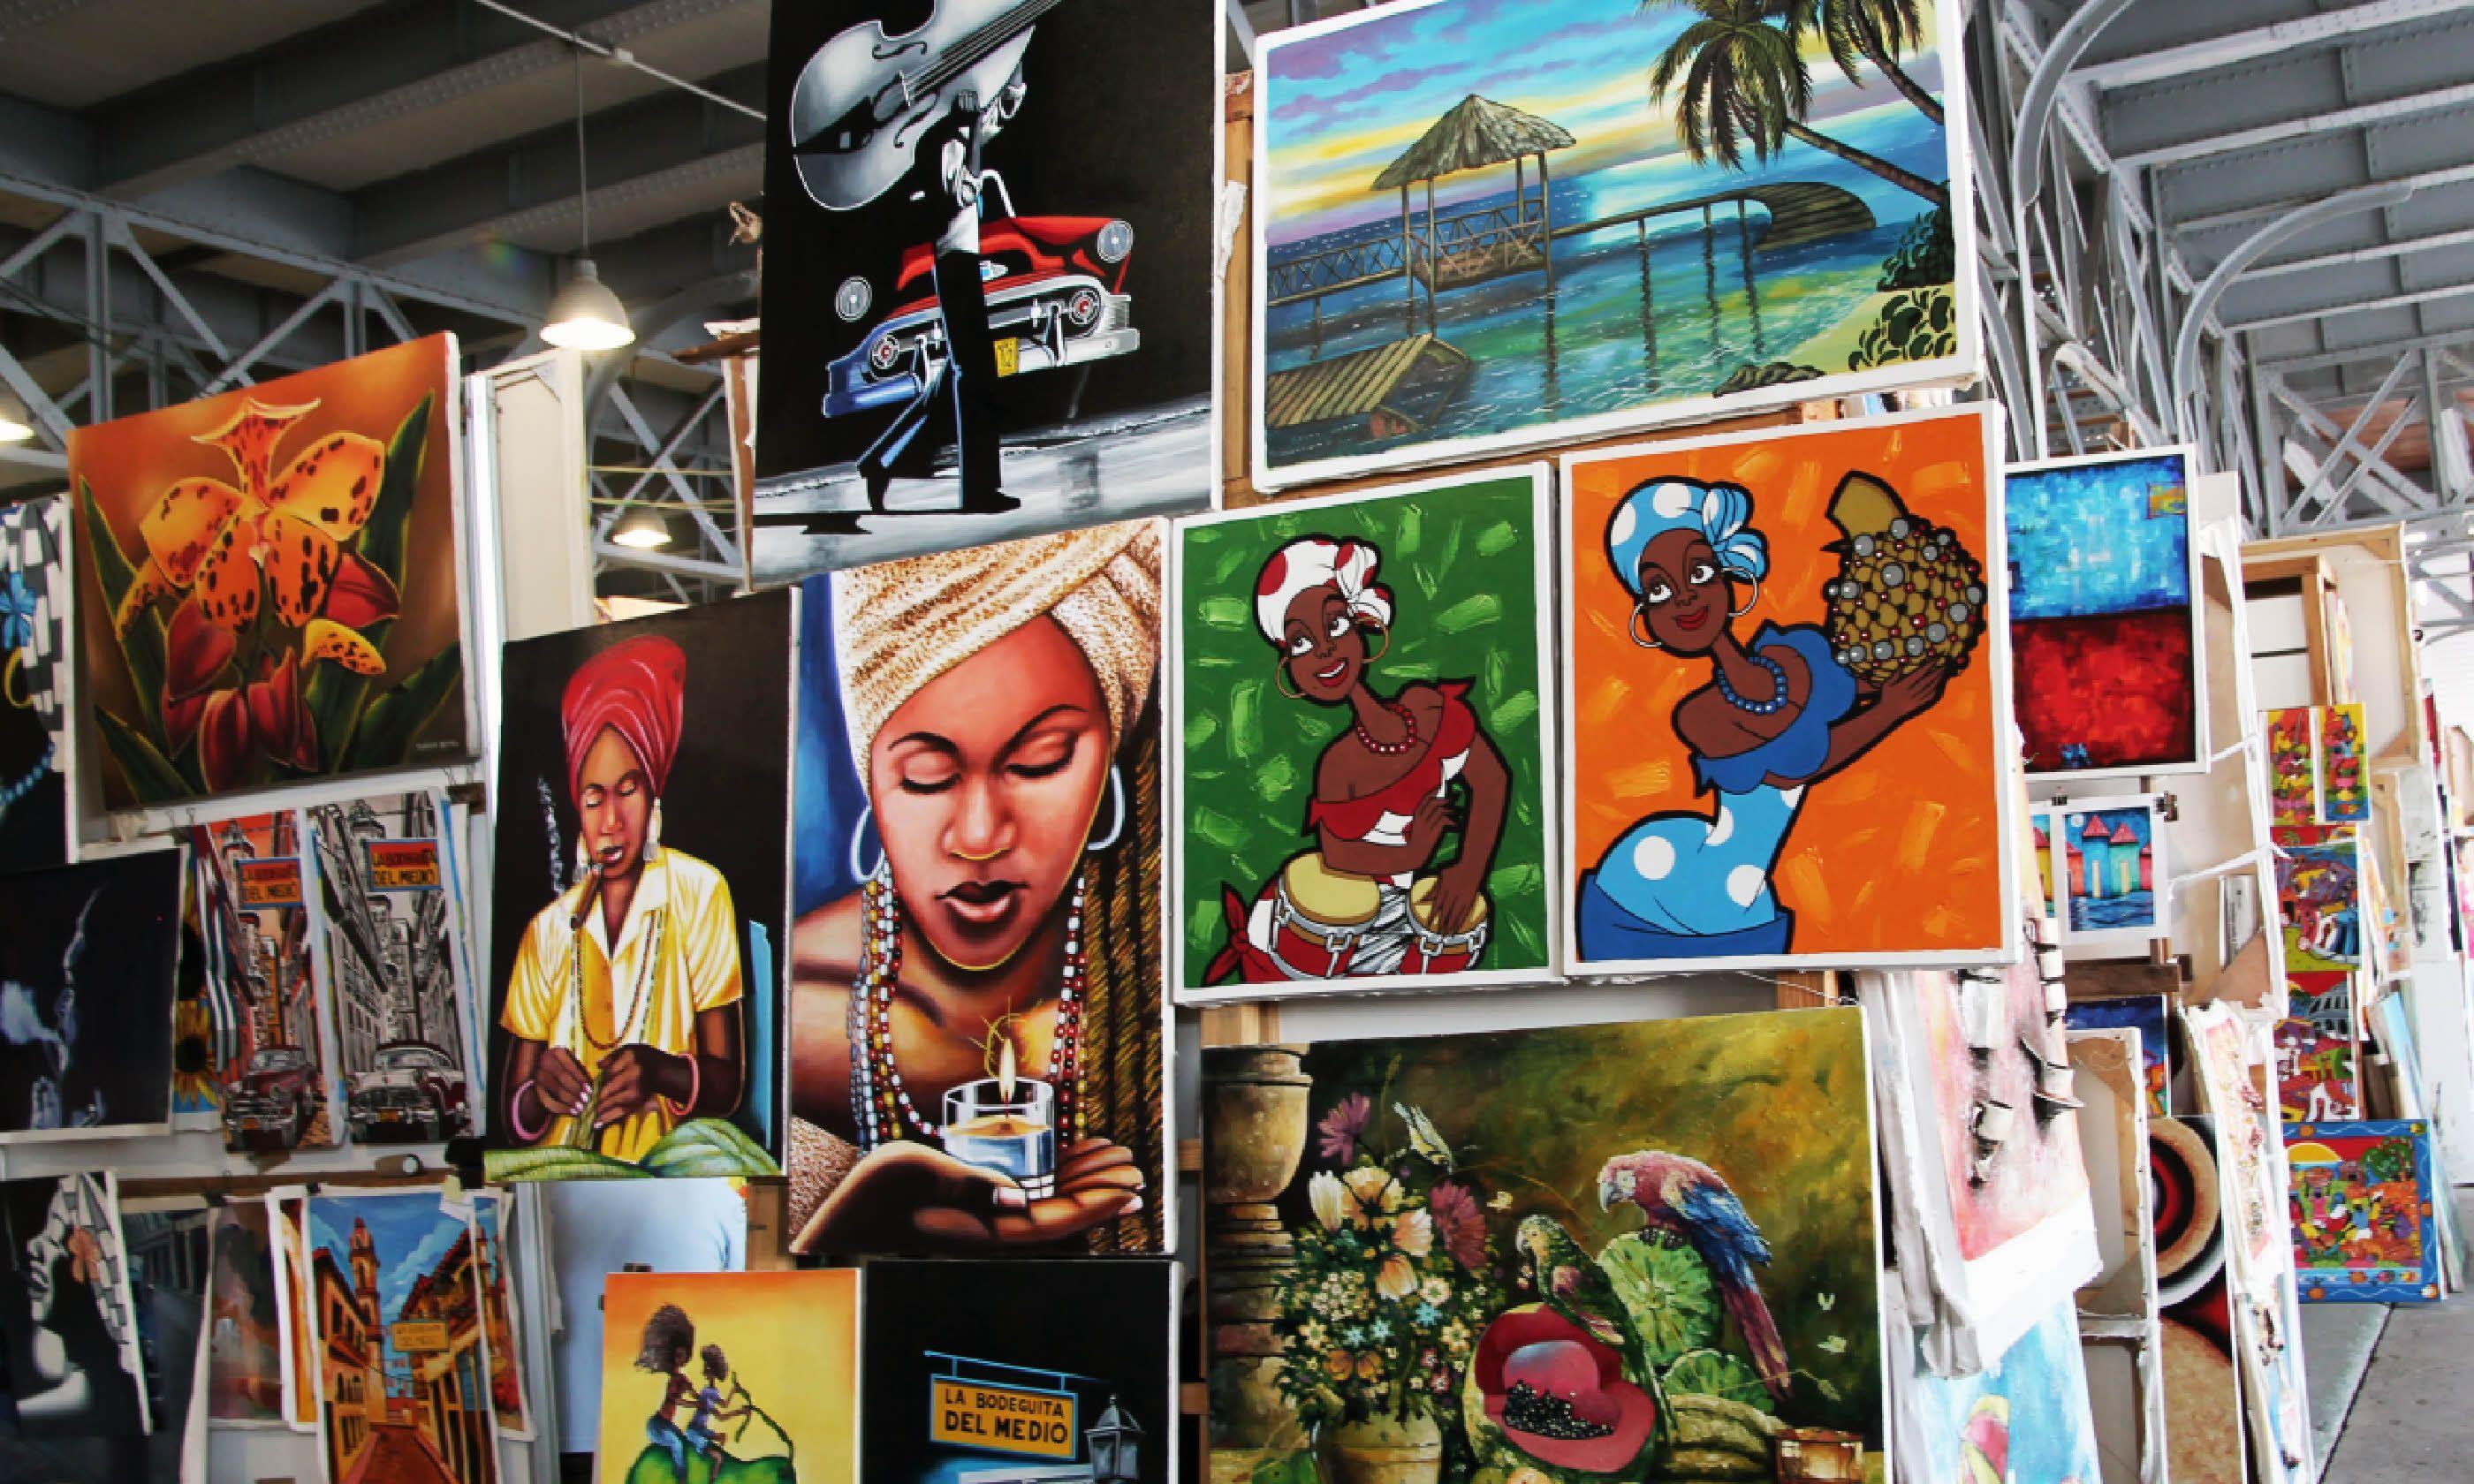 Cuban artists paintings (Dreamstime)